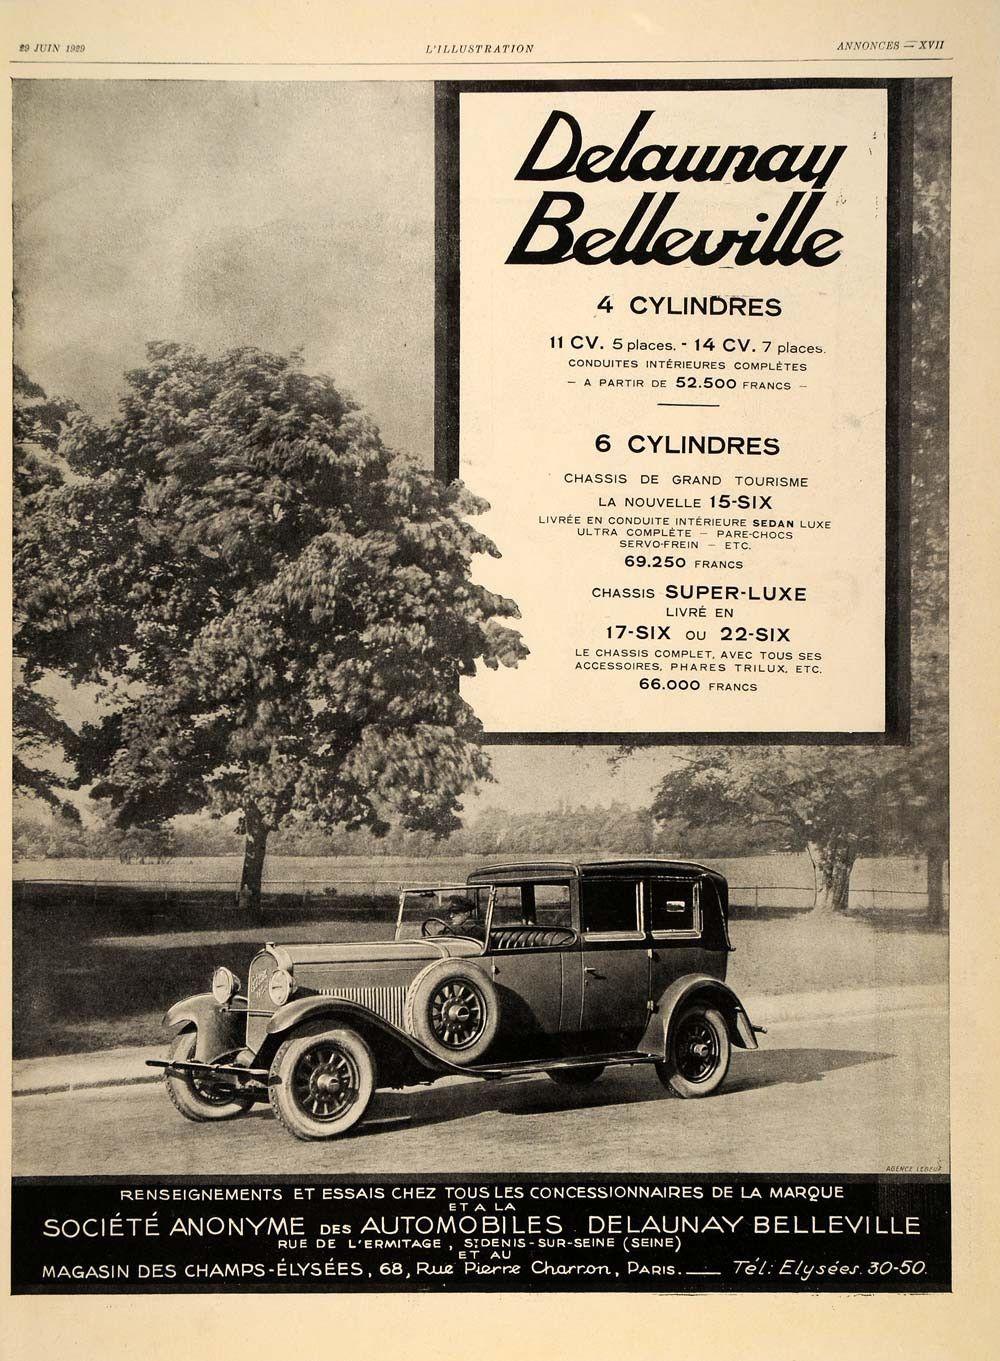 1929 French Ad Delaunay Belleville Vintage Automobile Original Ill1 Vintage Cars Automobile Classic Cars